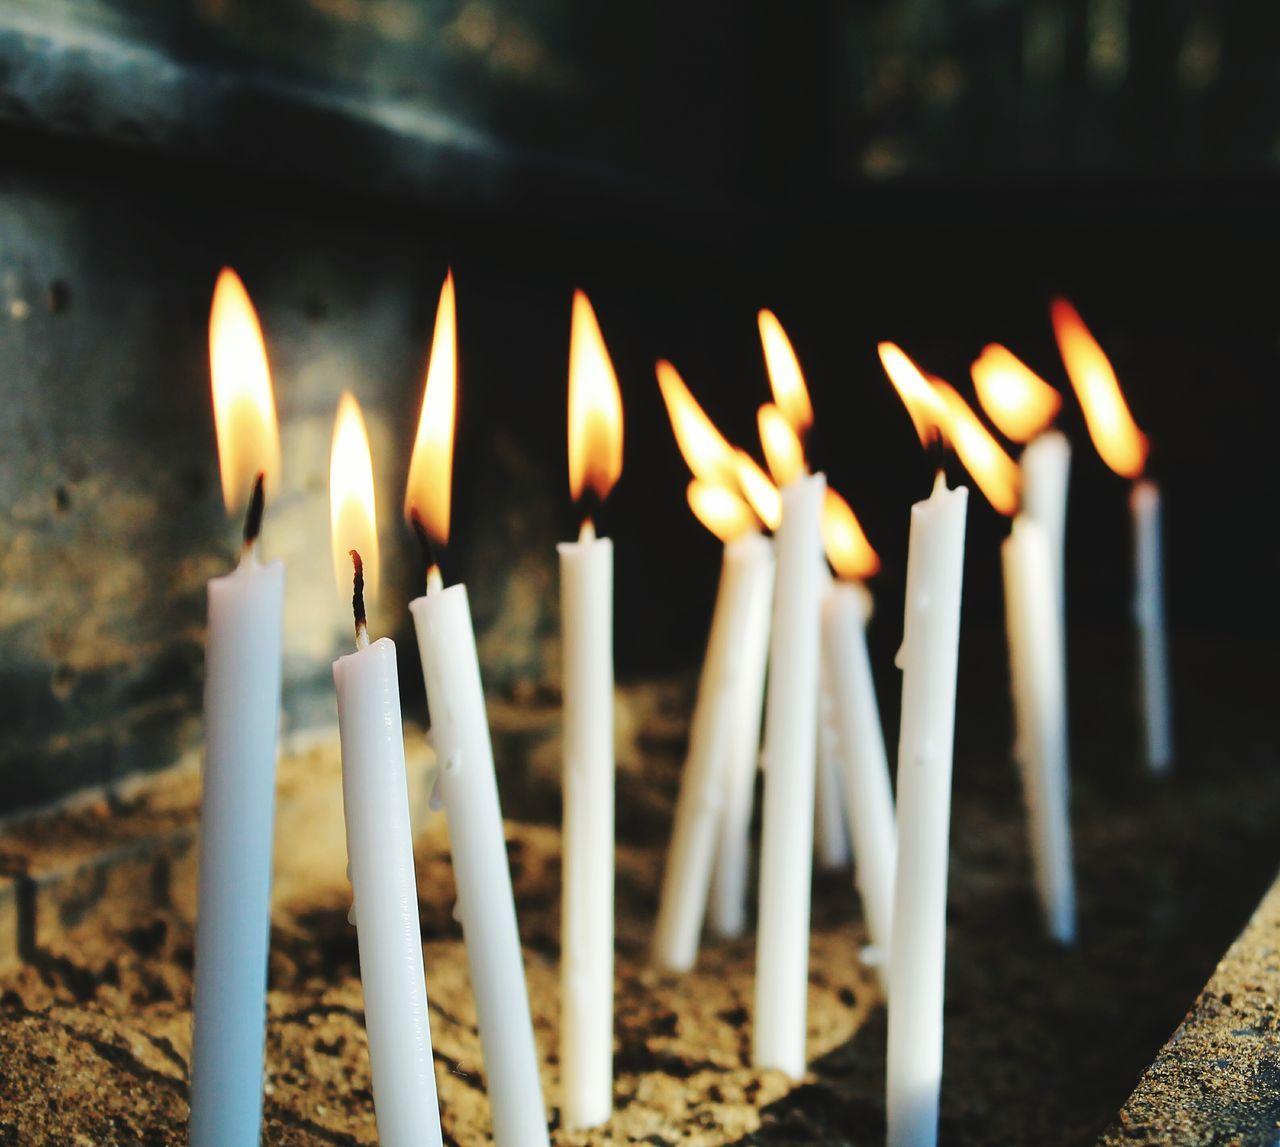 Meryemana Meryemanaevi Selçuk Candle Great Tolightacandle Towish Makeawish Tofeelgood Datetrip Hearrespection Goodpeople Visit Turkey Ancient City Canonphotography Canon1100d